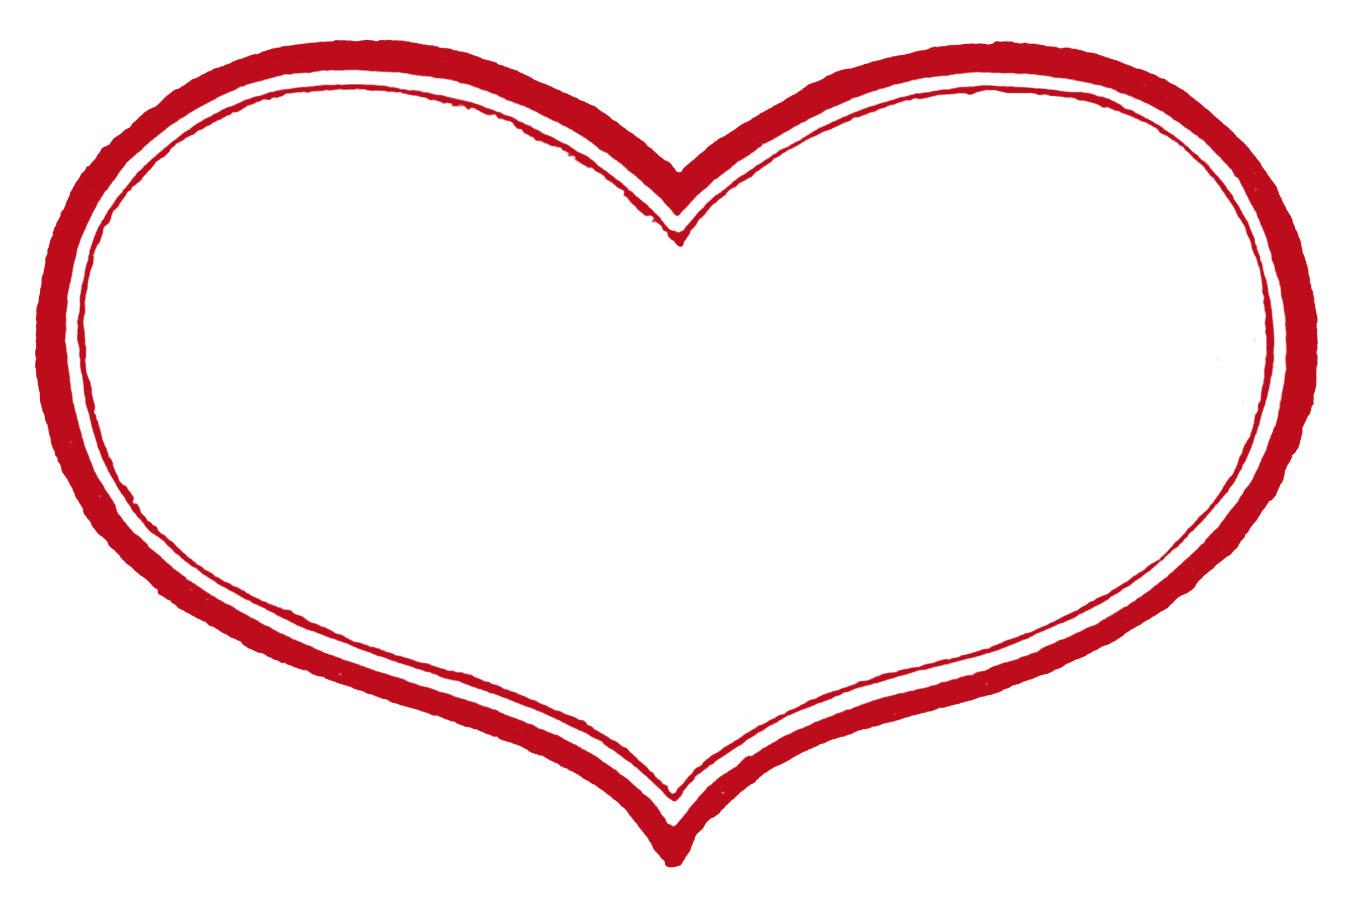 Heart-shaped clipart printable #2